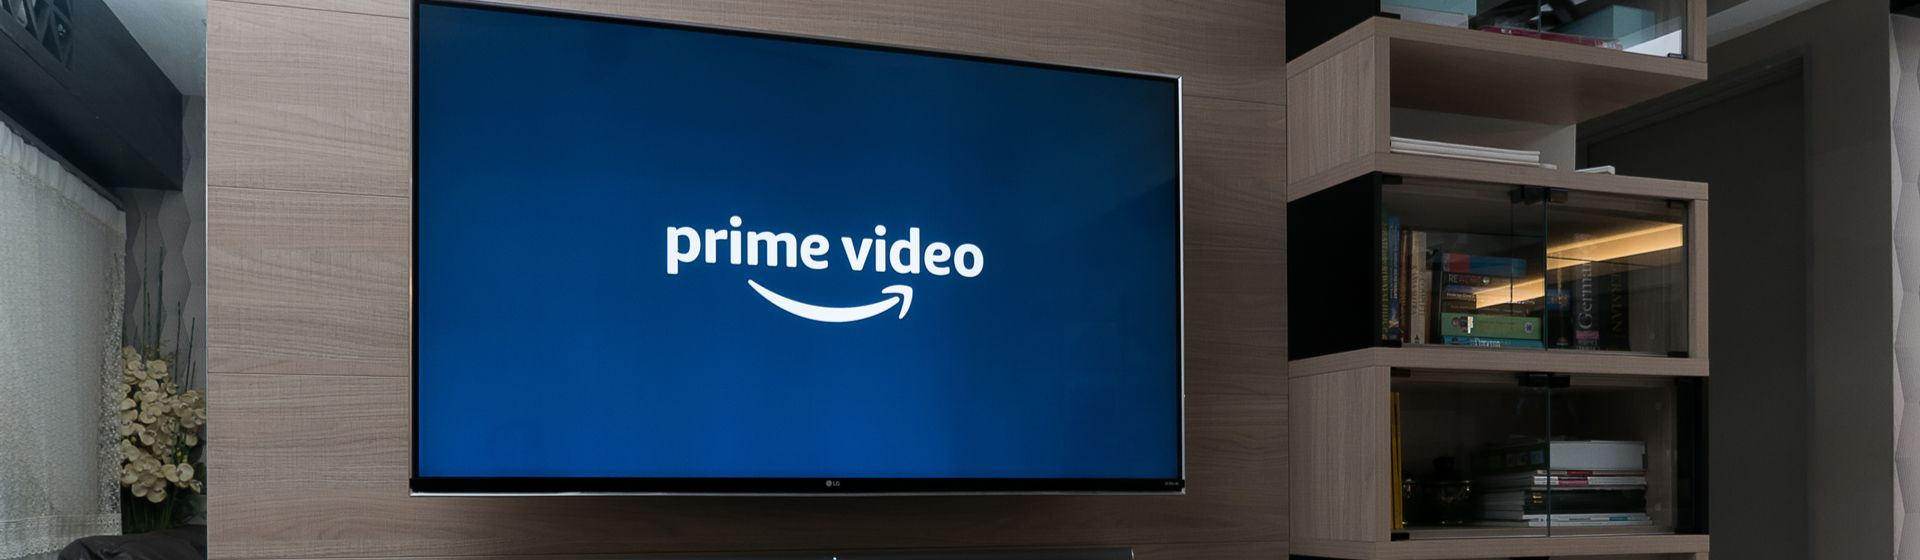 Como assistir Amazon Prime na TV? Confira o passo a passo